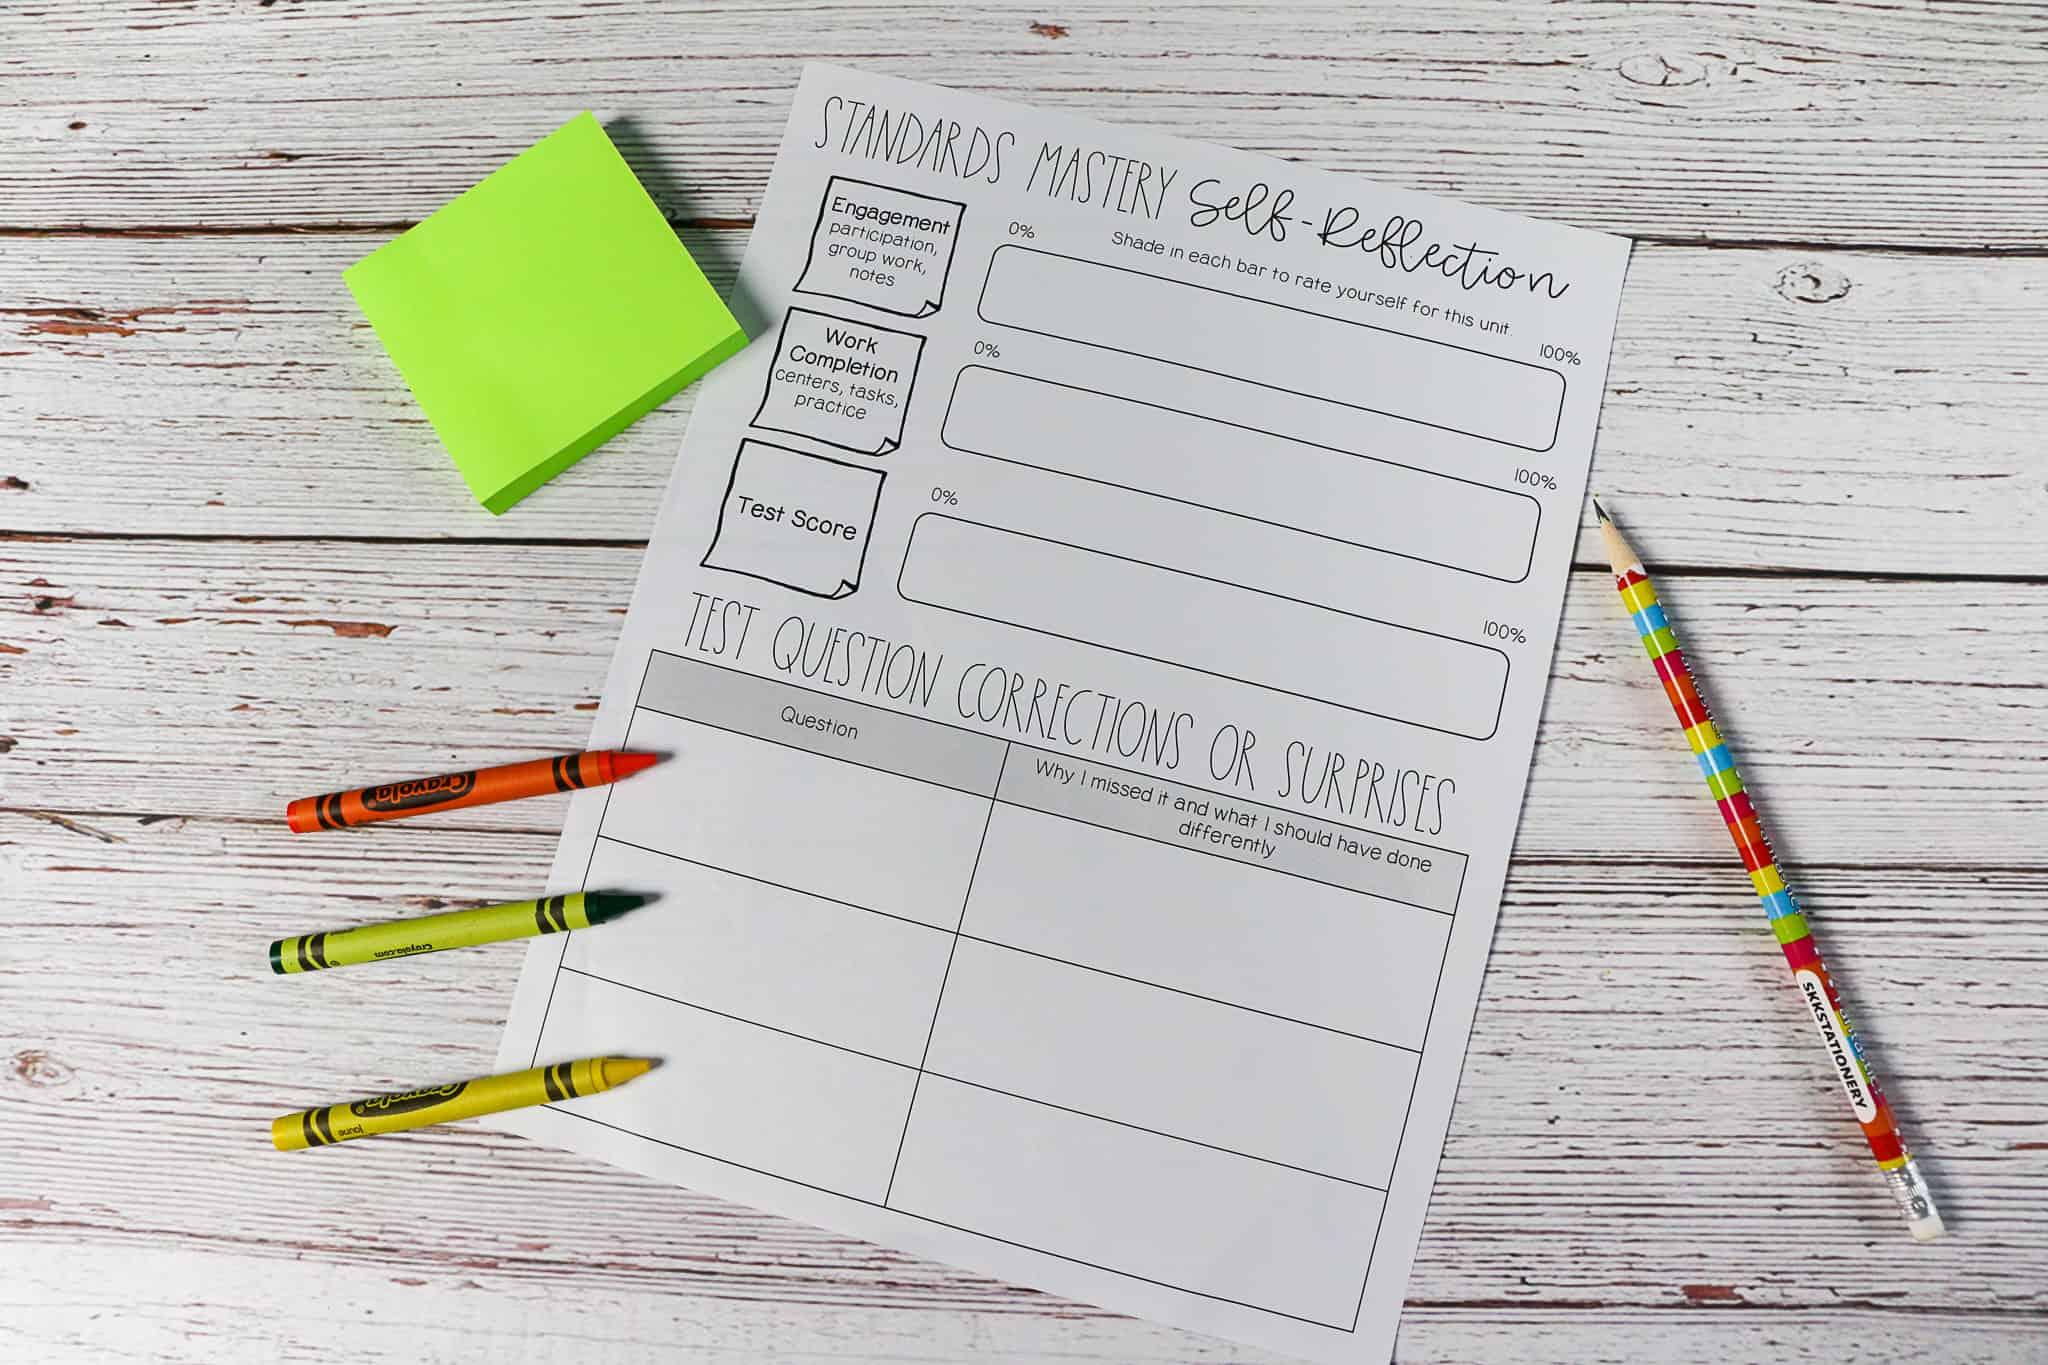 Student Worksheet For Self Reflection